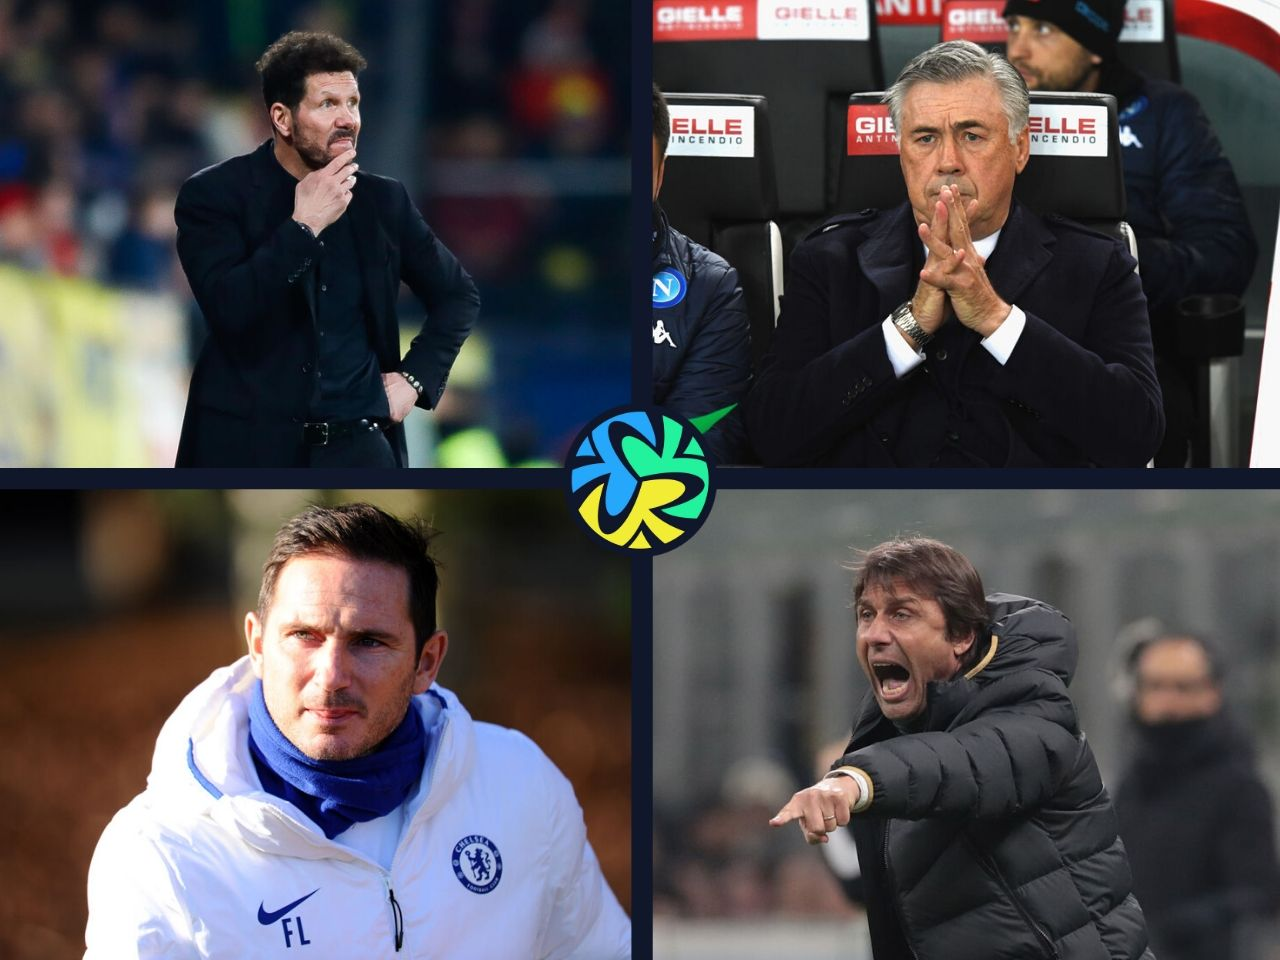 Chelsea Liverpool Champions League